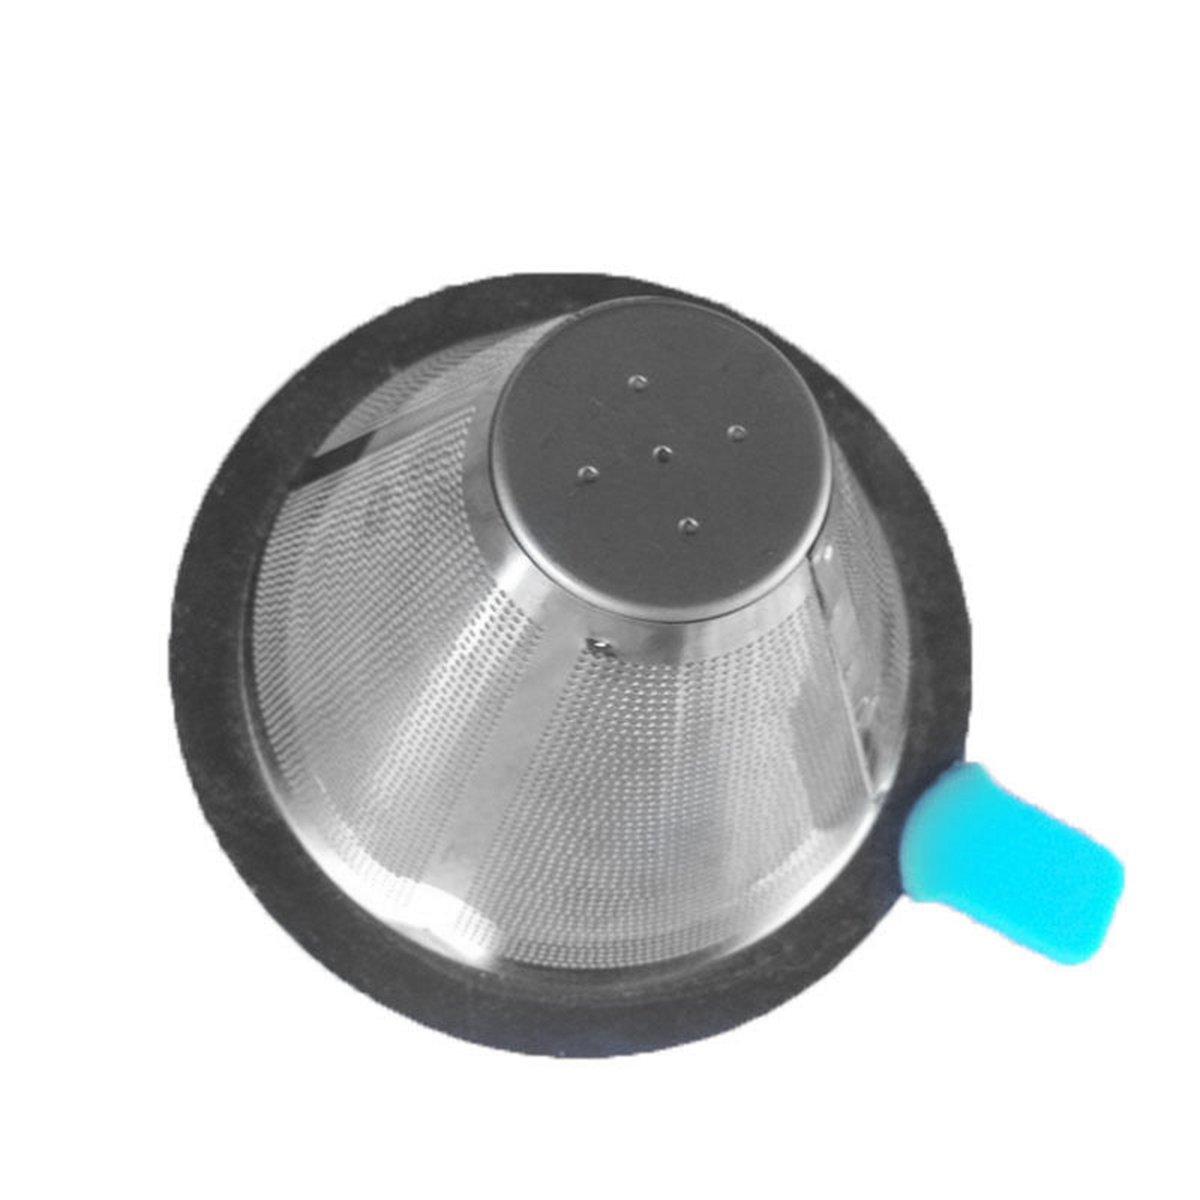 aodeweコーヒーフィルタFunnel絞らpour Over Tea Coffee DripperステンレスメッシュStrainer   B0761FSSNS